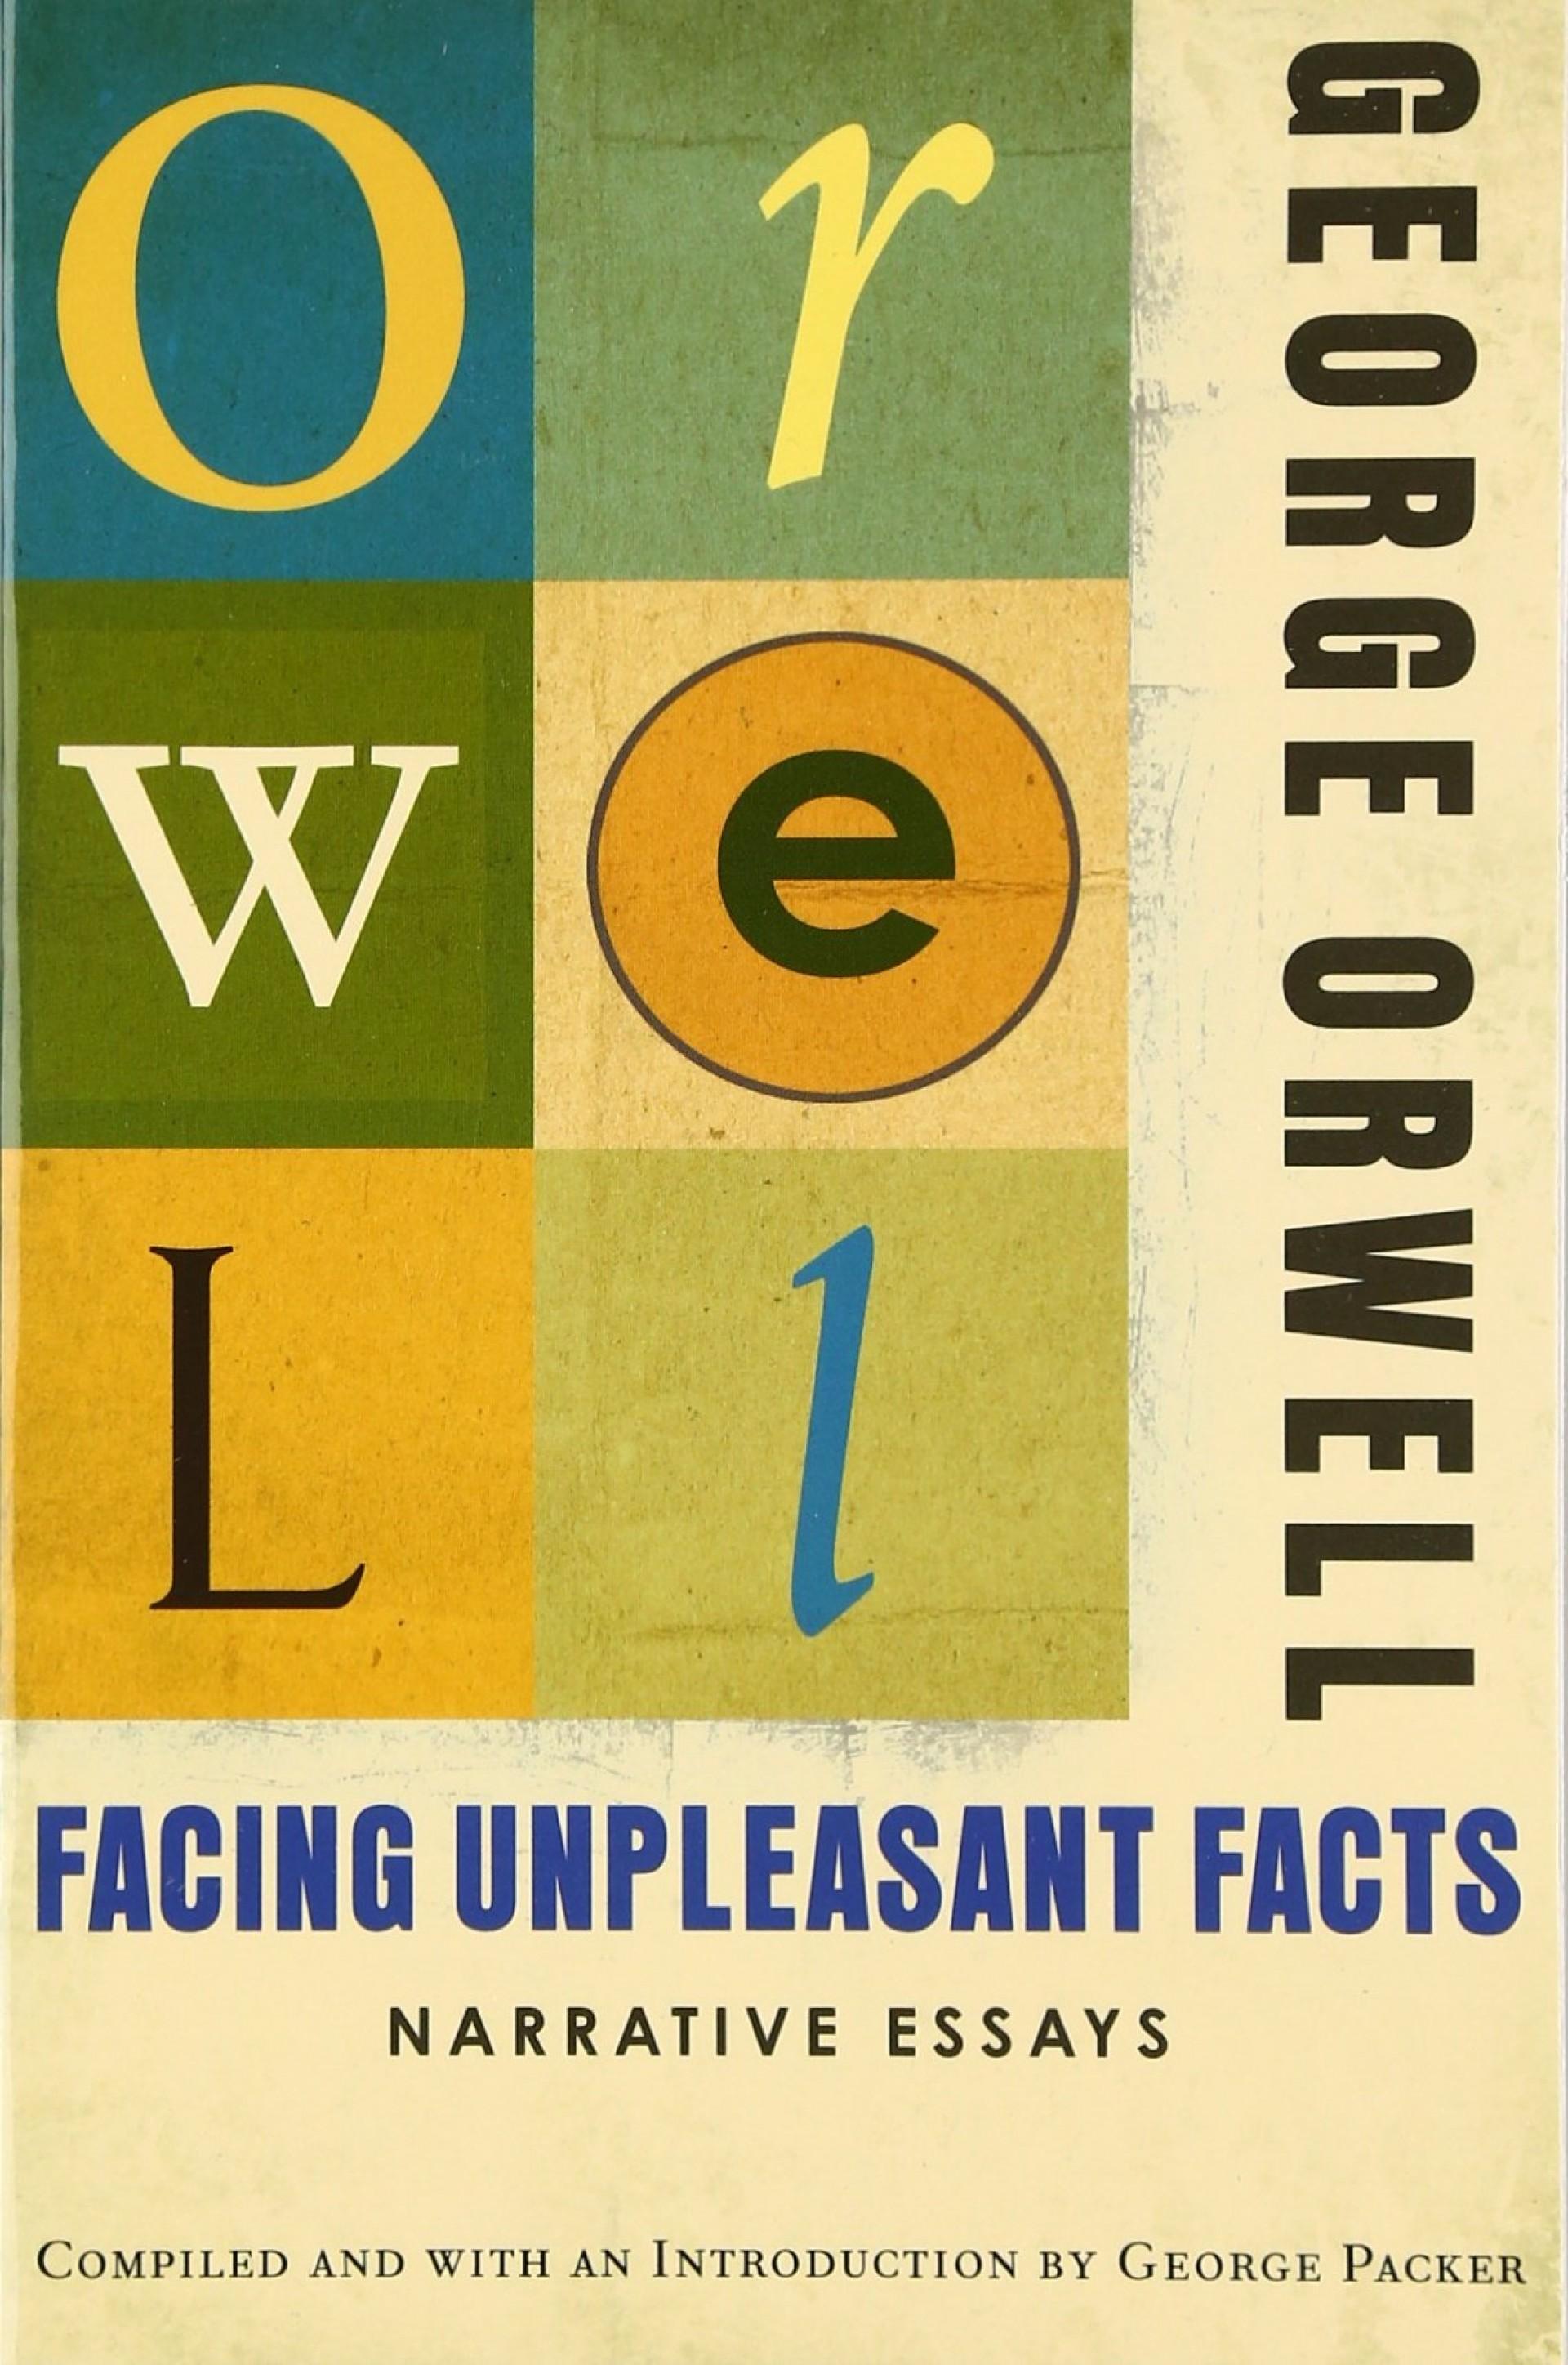 023 Essay Example 817mi1ypesl George Orwell Frightening Essays 1984 Summary Collected Pdf On Writing 1920